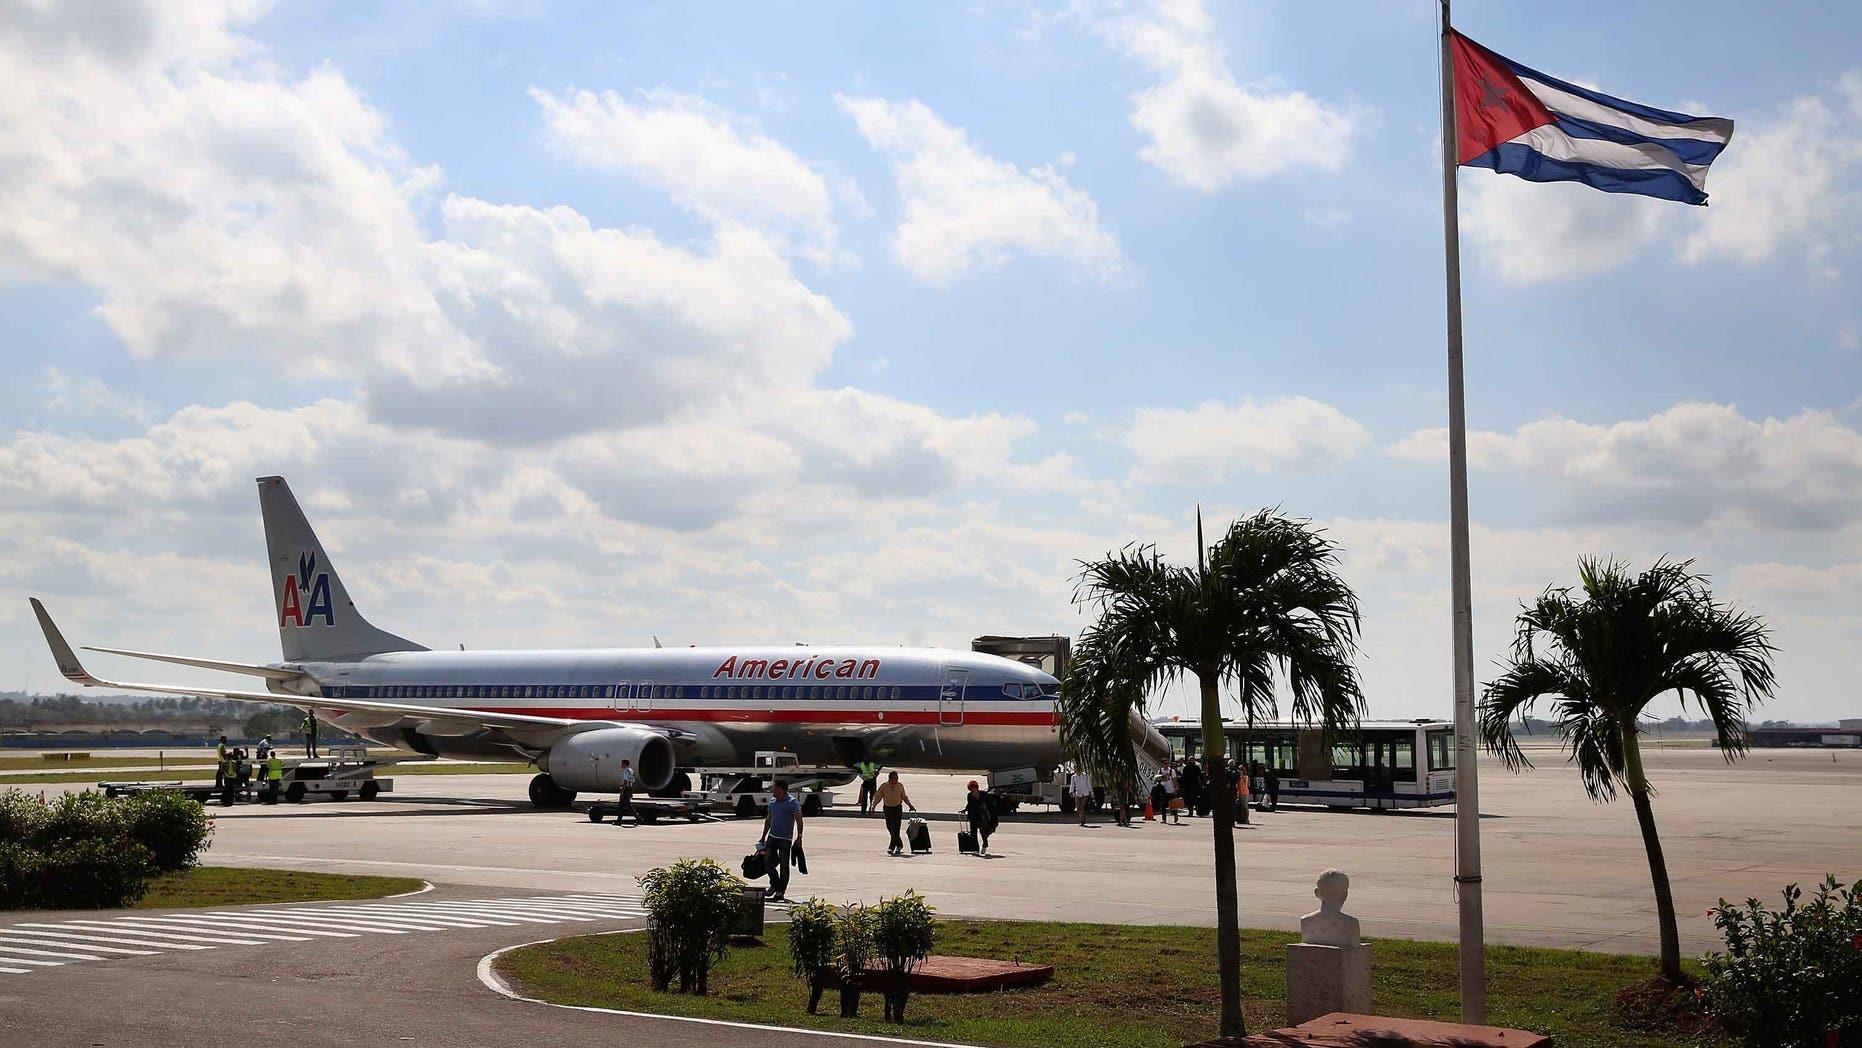 Passengers arrive at Jose Marti International Airport on a charter plane on January 19, 2015 in Havana, Cuba.